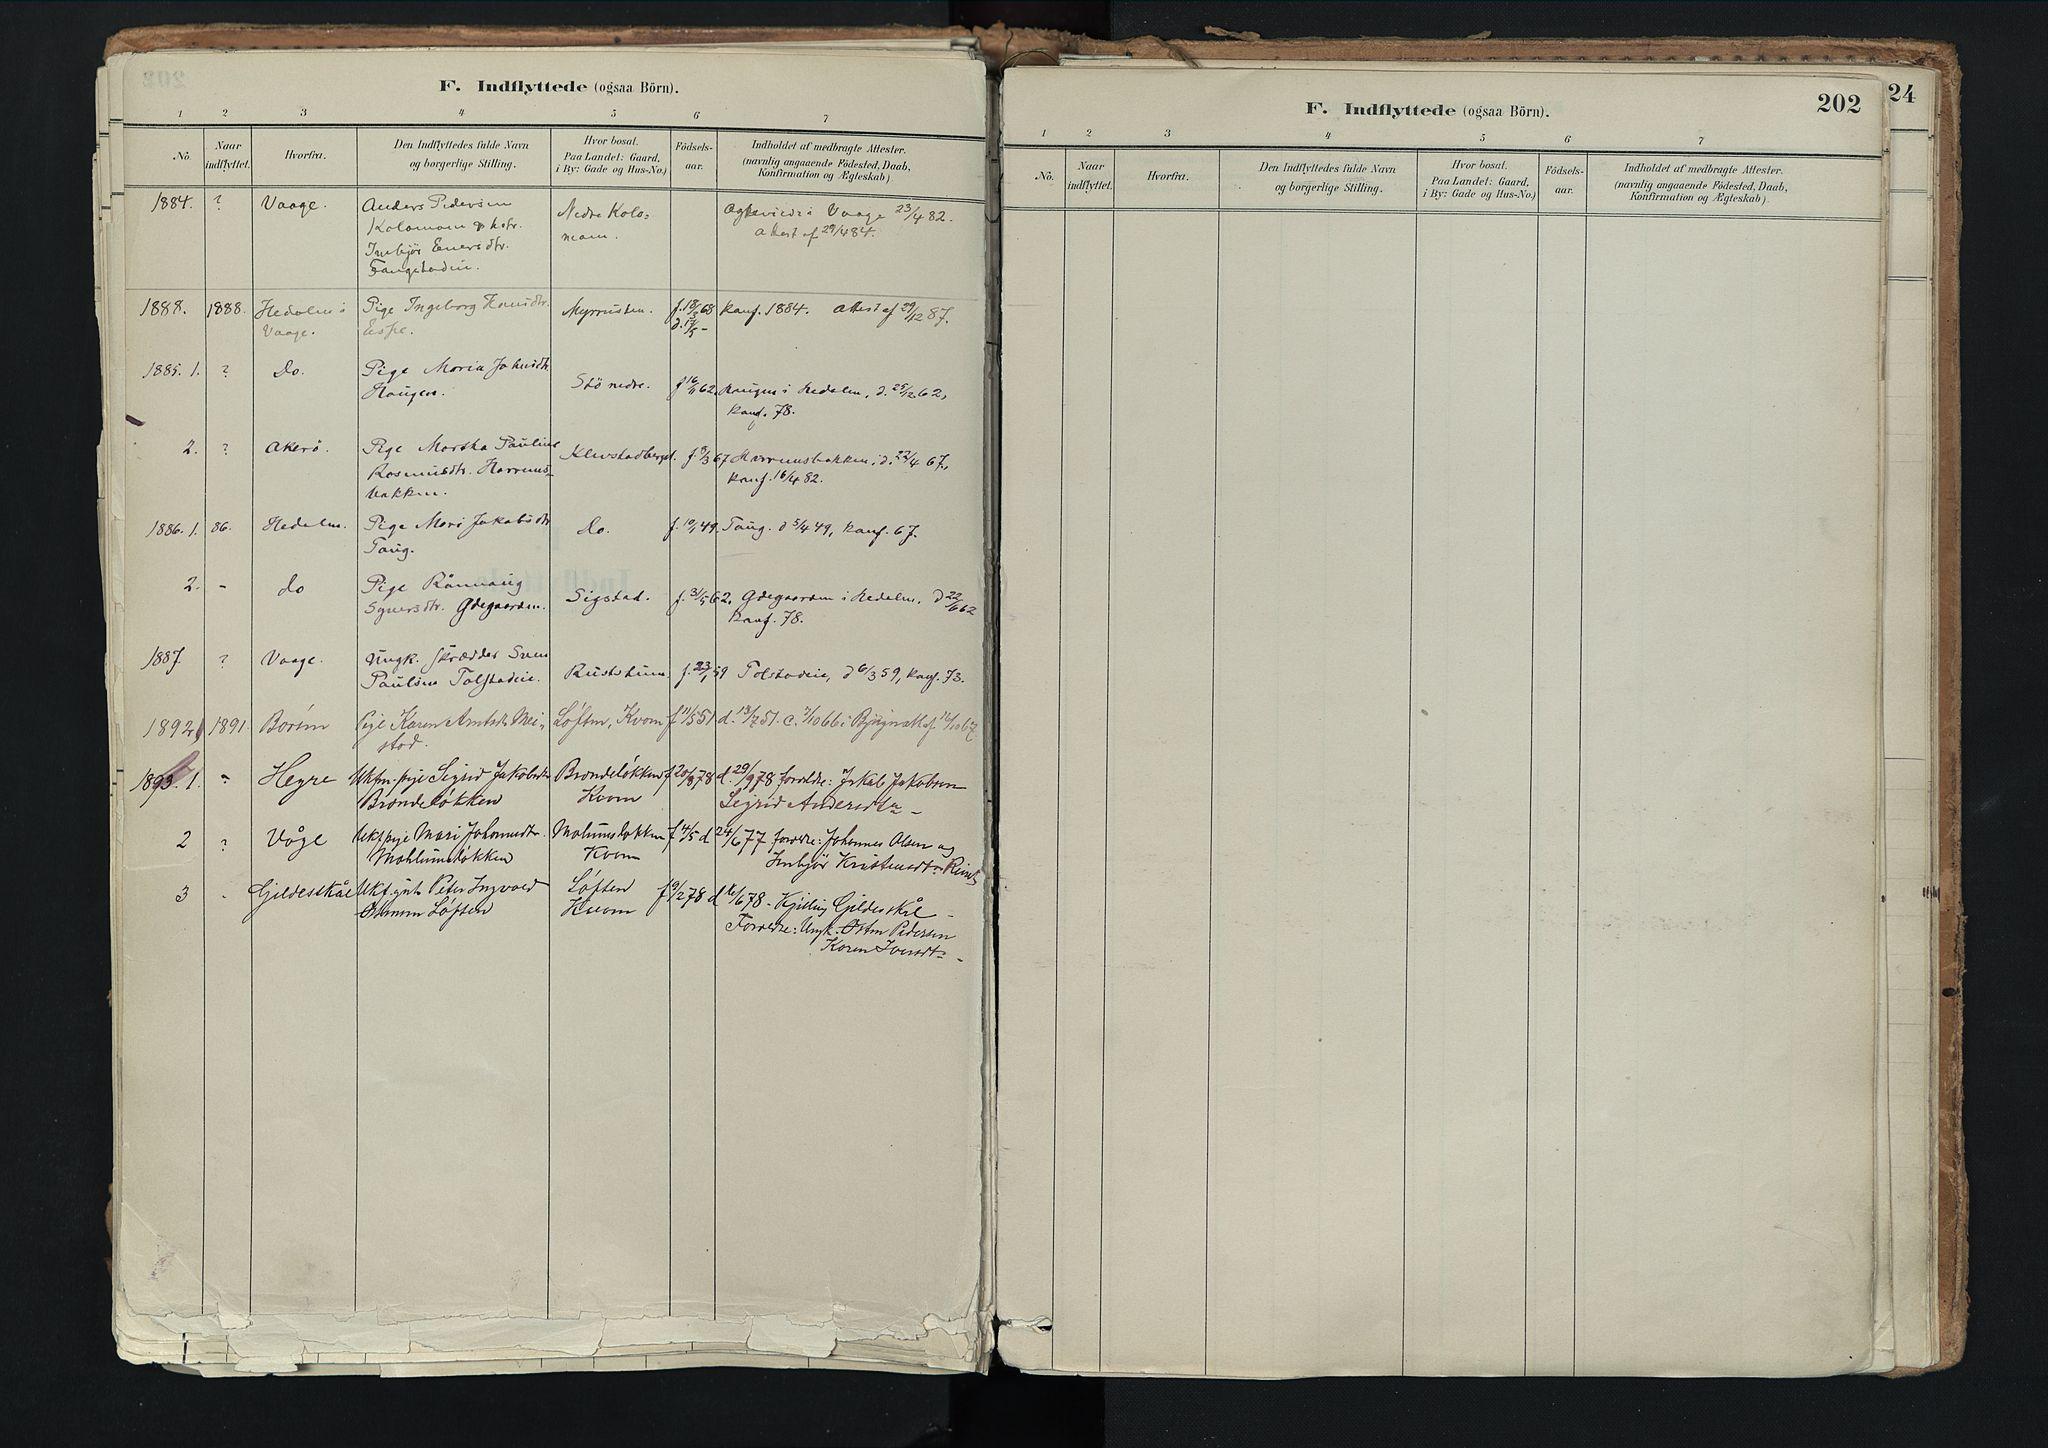 SAH, Nord-Fron prestekontor, Ministerialbok nr. 3, 1884-1914, s. 202